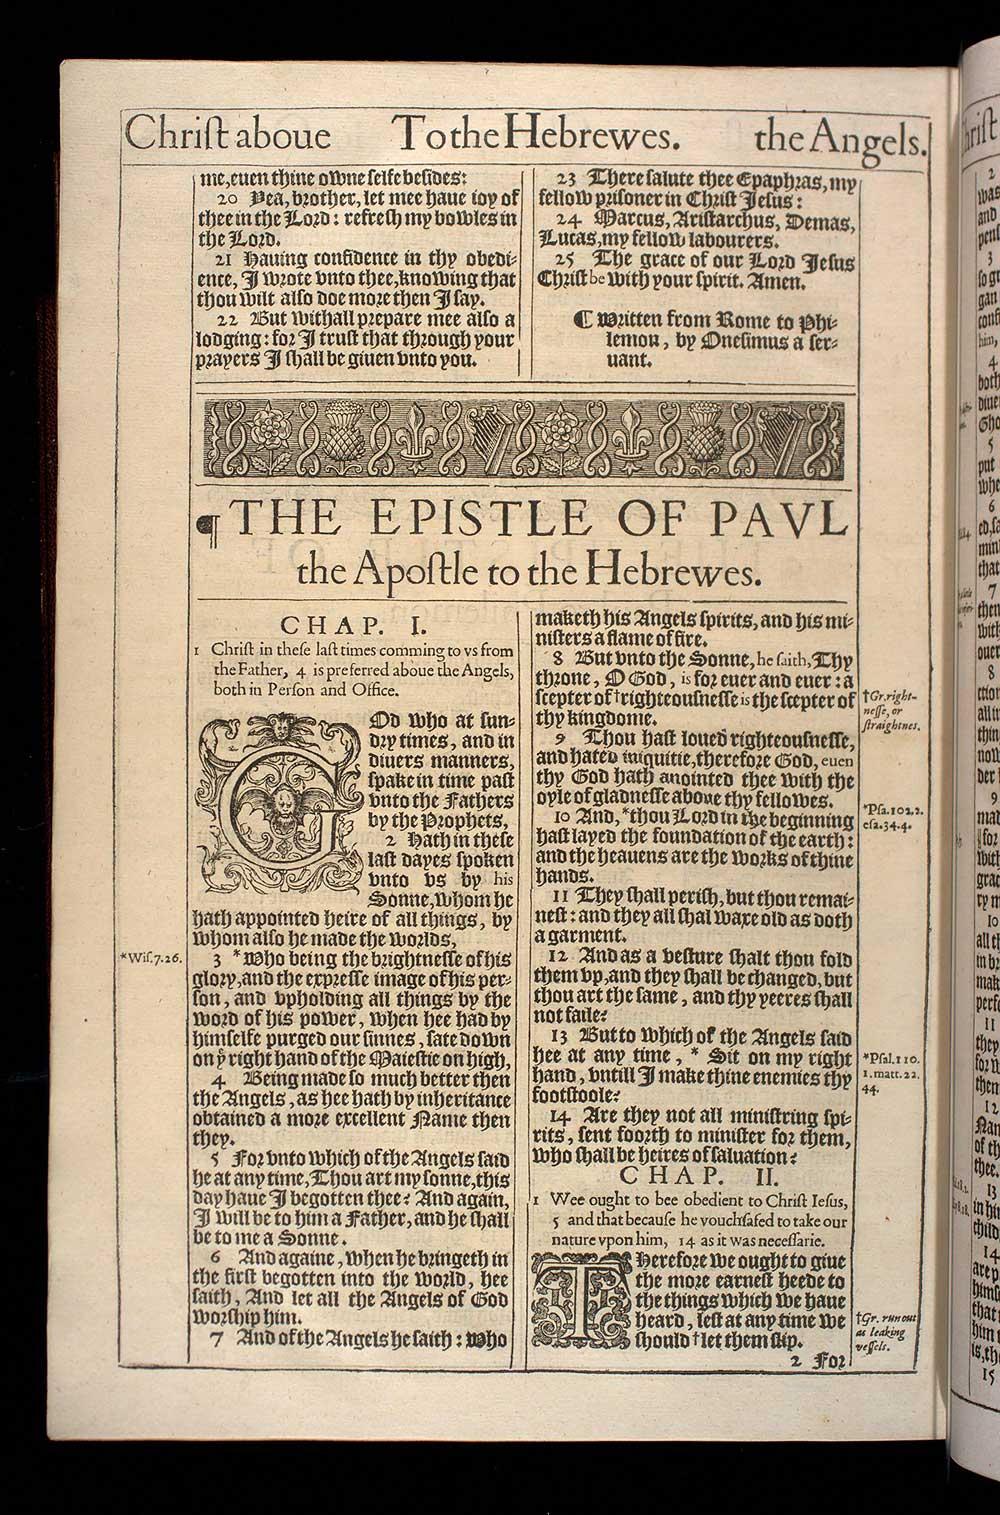 THE EPISTLE OF PAUL TO PHILEMON. (ORIGINAL 1611 KJV)